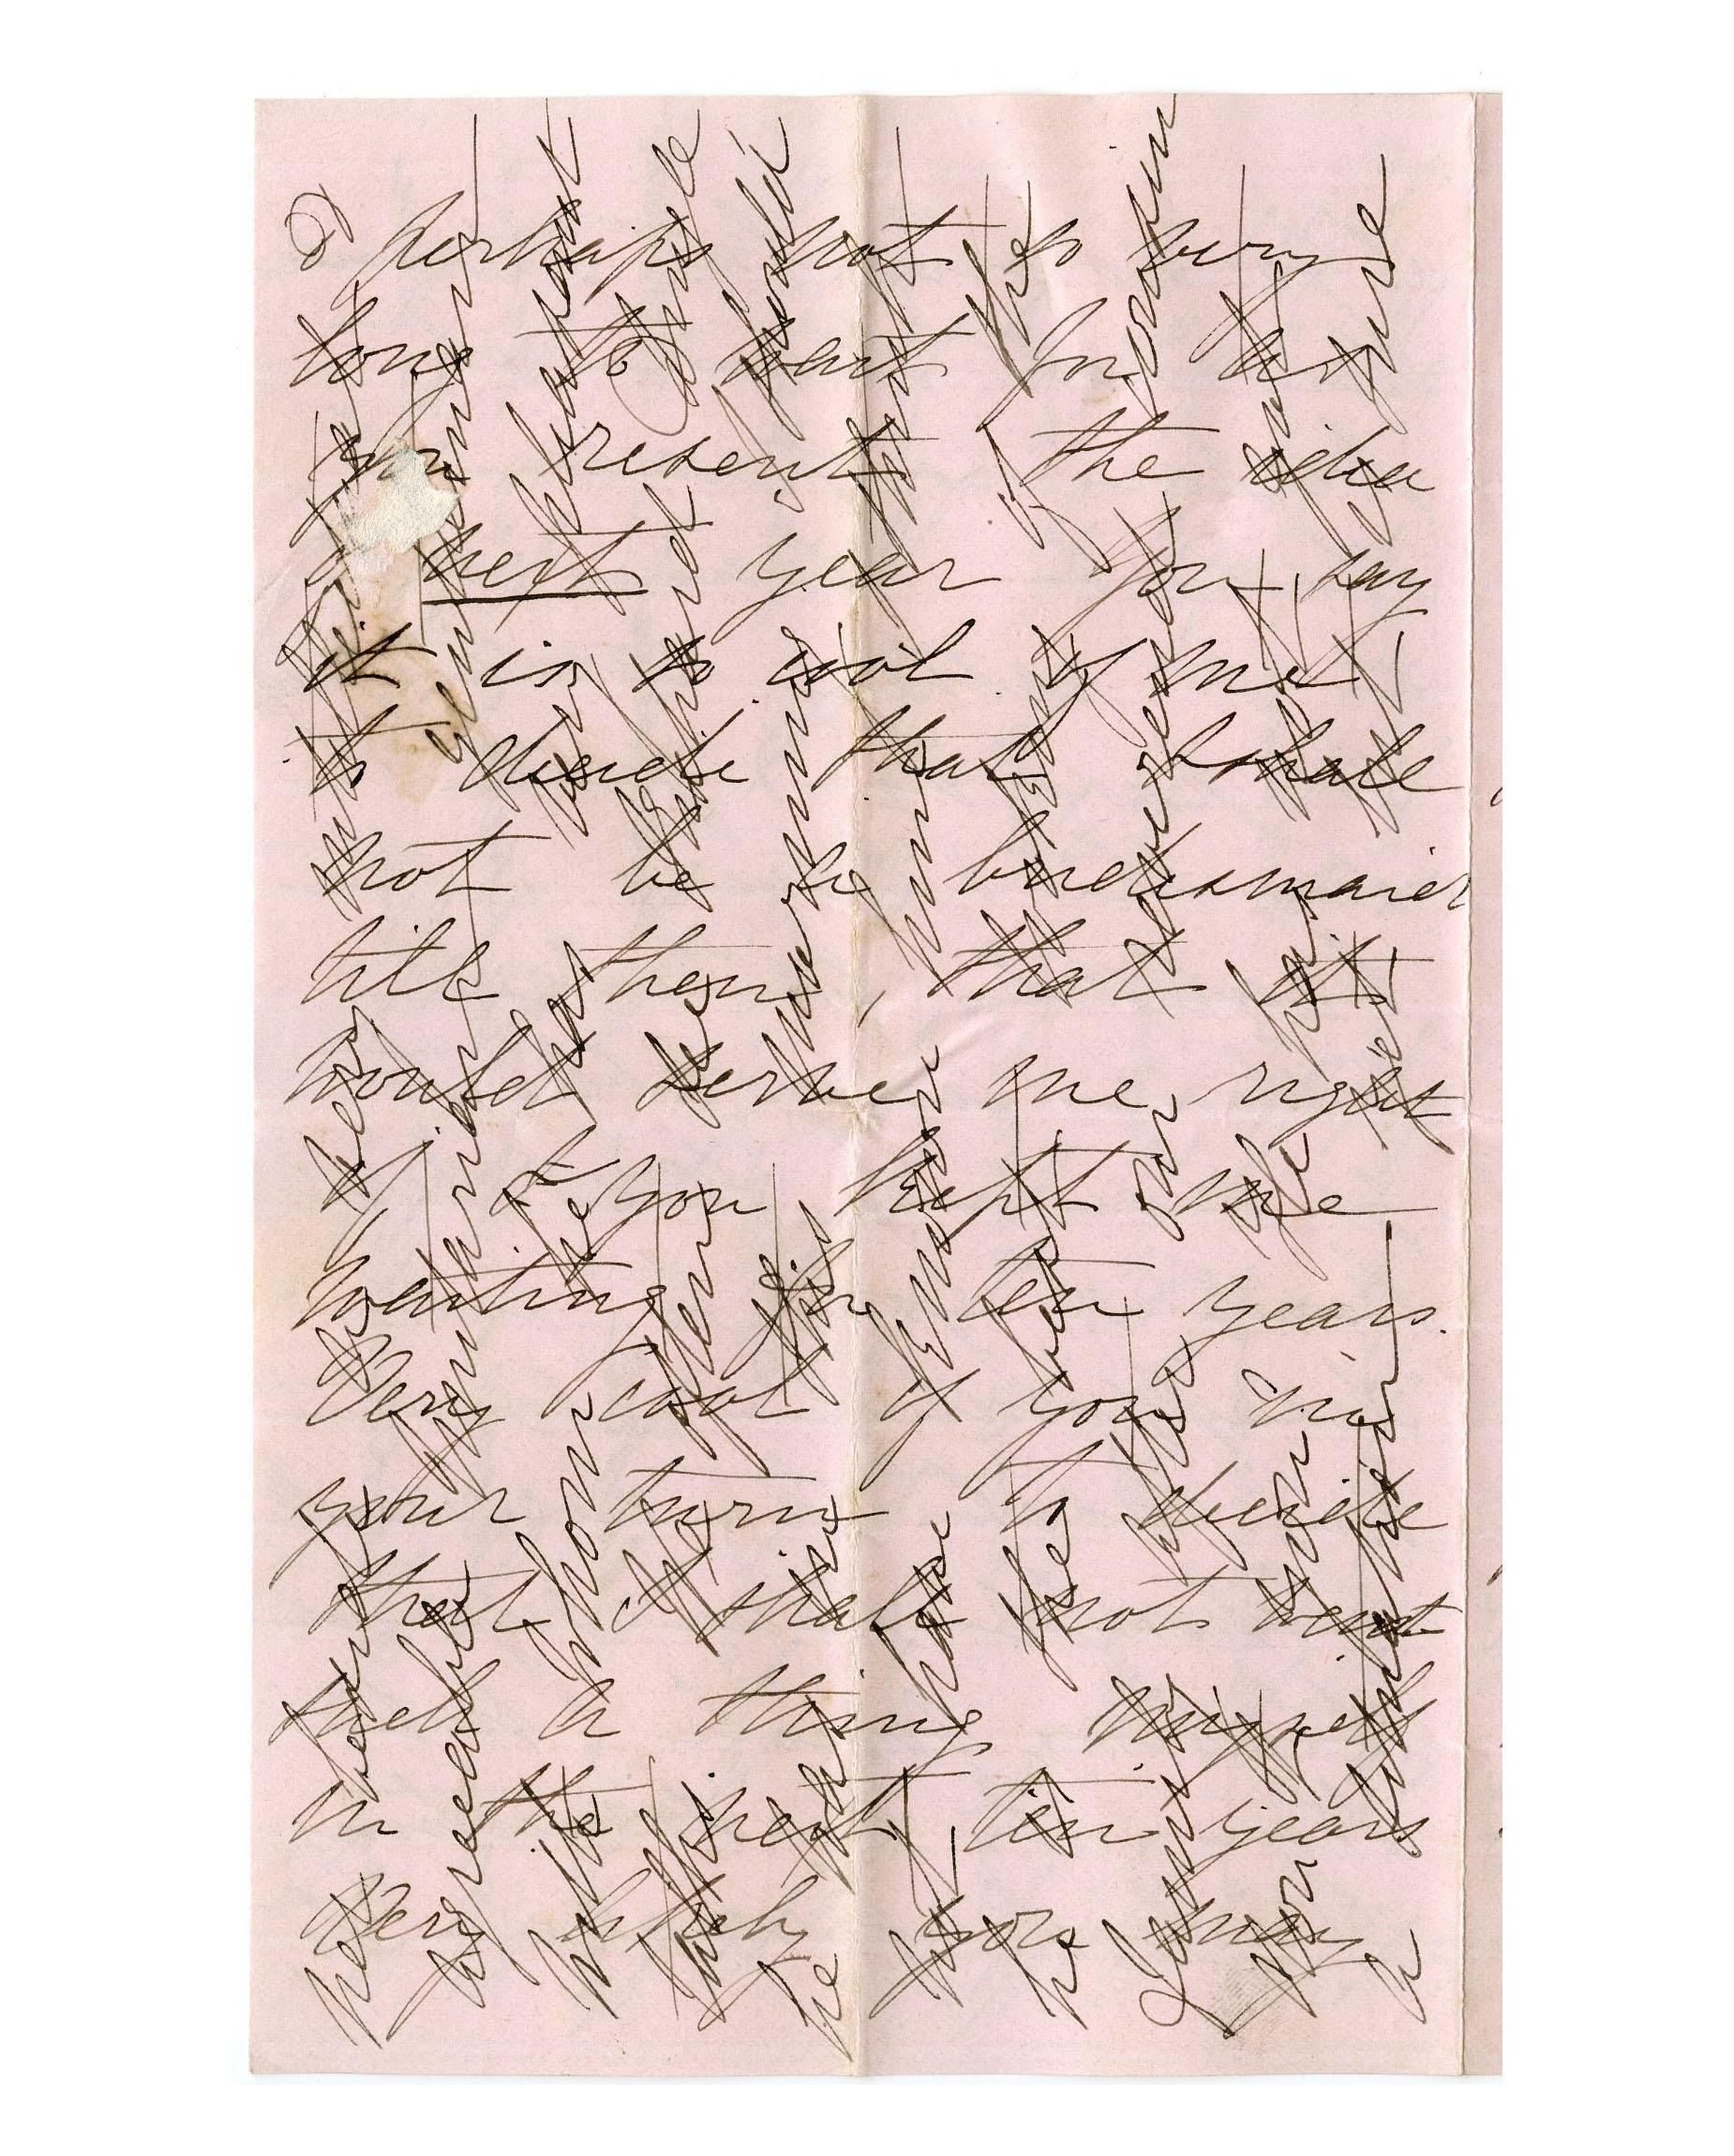 Old letter regarding the Adams family